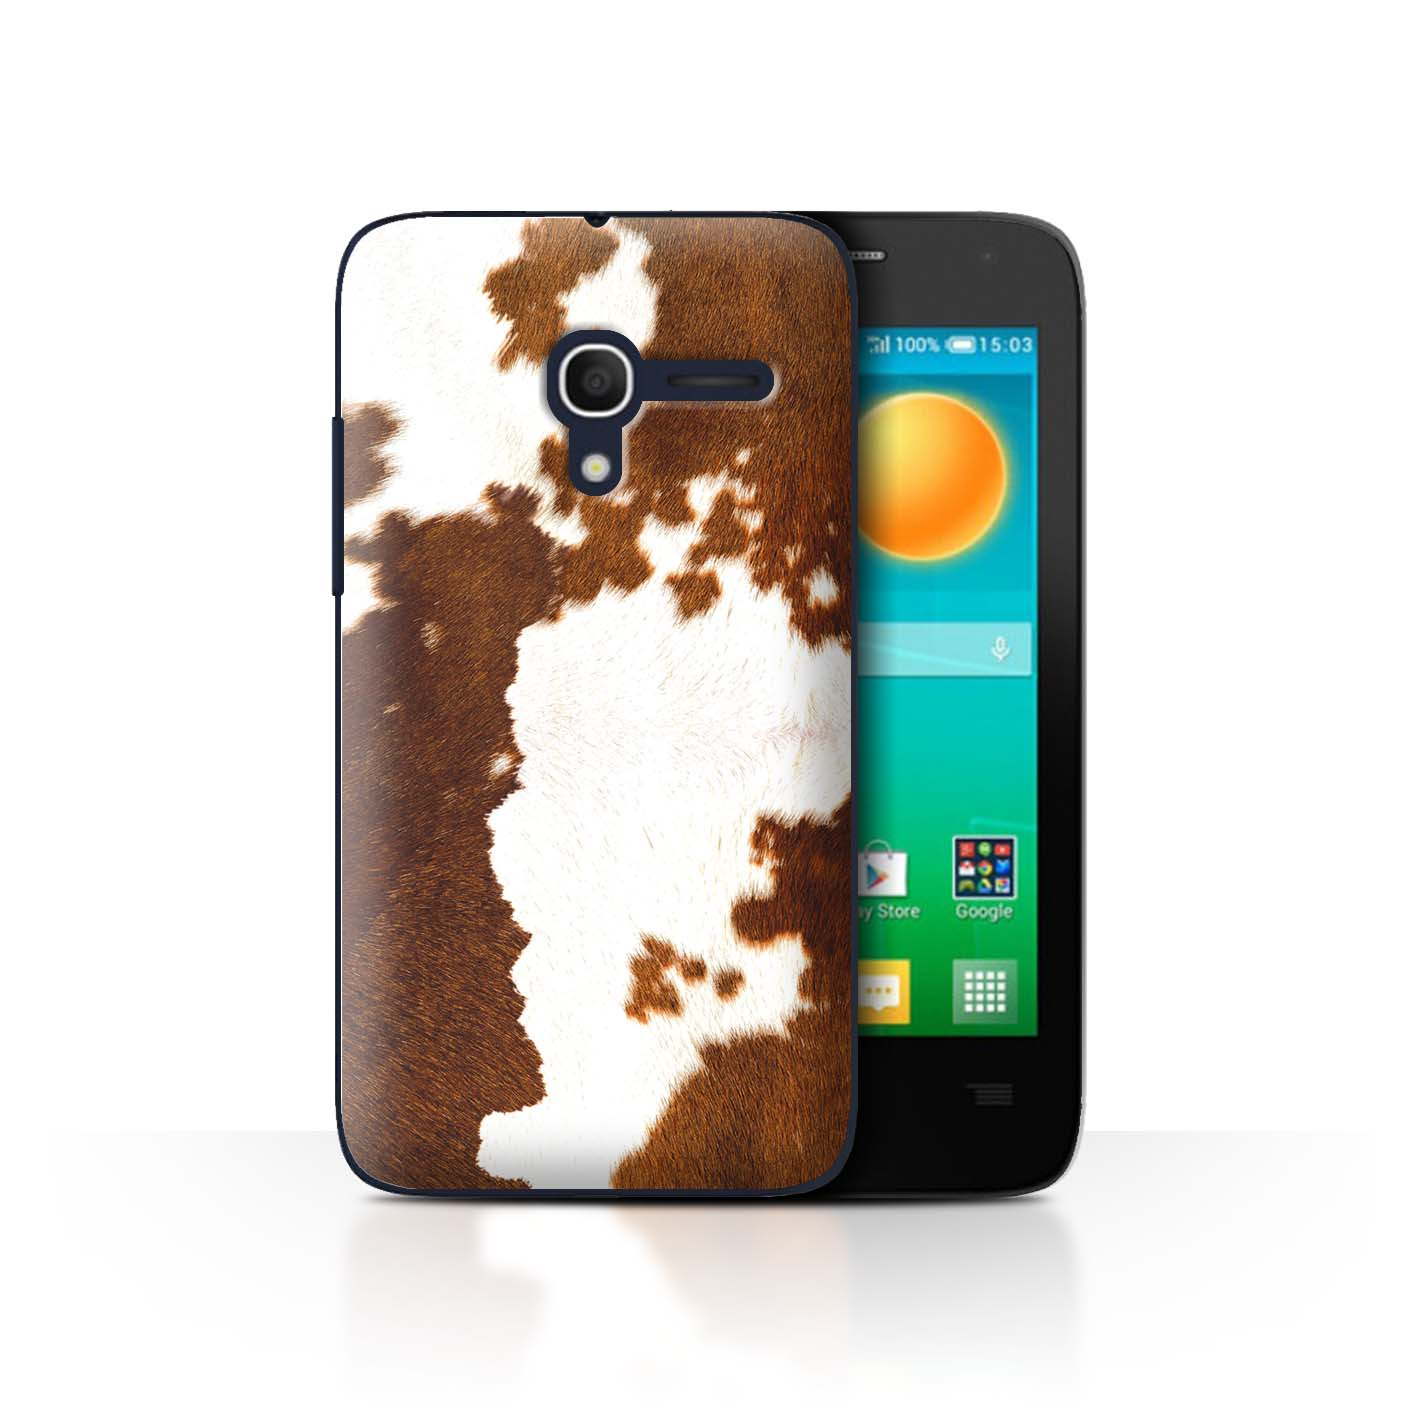 STUFF4-Back-Case-Cover-Skin-for-Alcatel-Pop-D3-Animal-Fur-Effect-Pattern